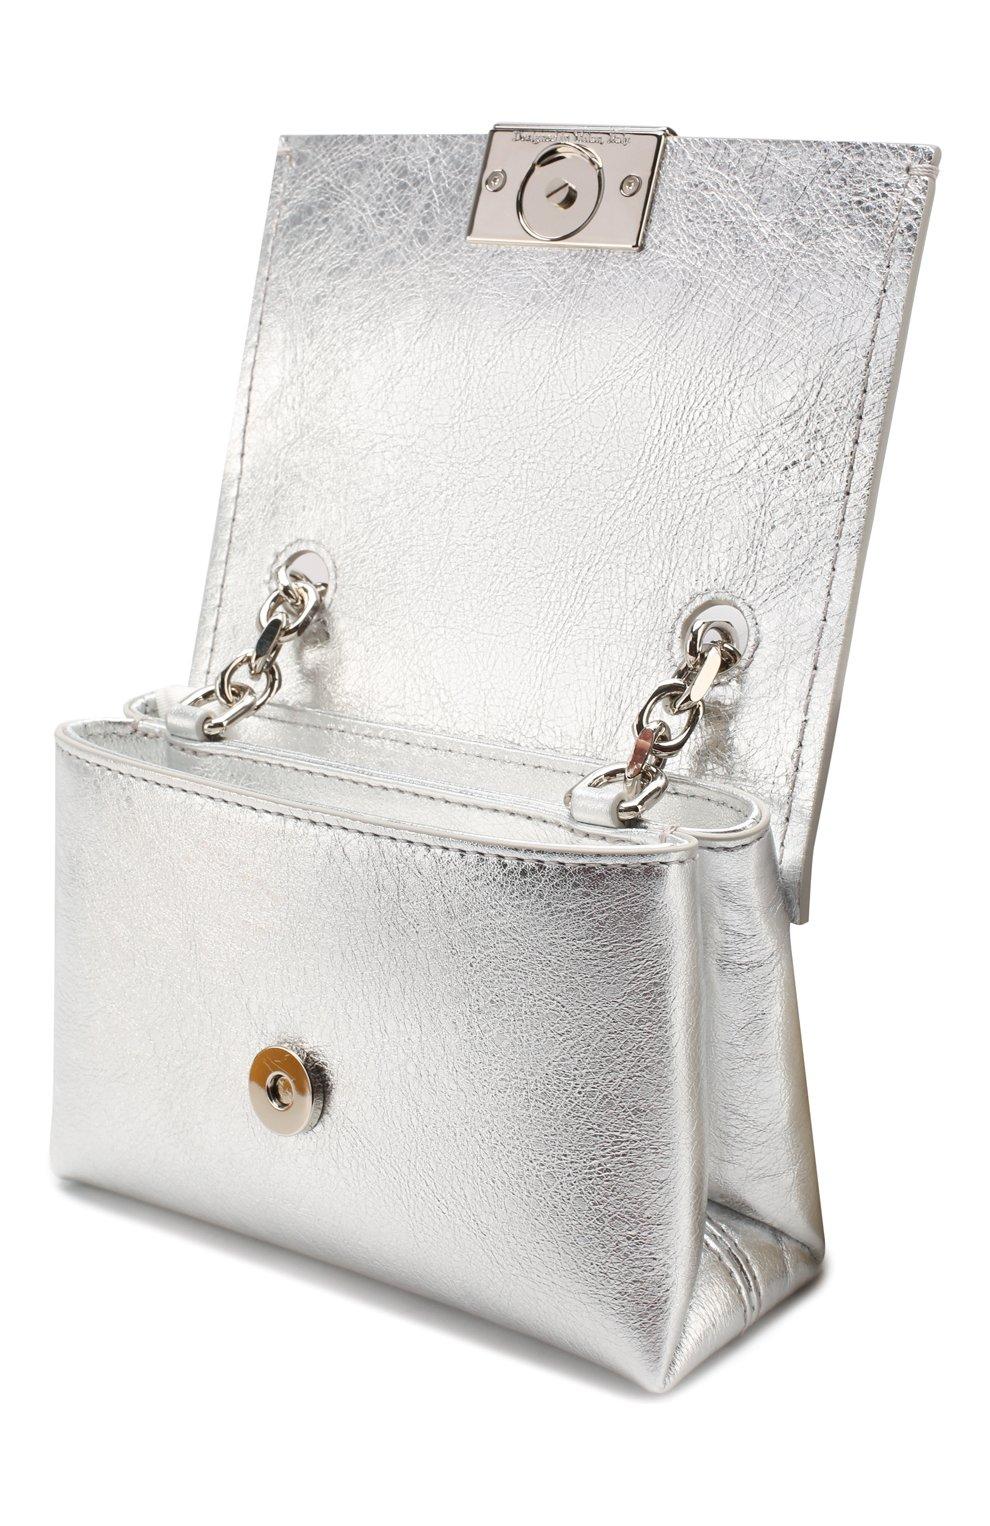 Женская сумка soft small OFF-WHITE серебряного цвета, арт. 0WNA121S20LEA0027200 | Фото 4